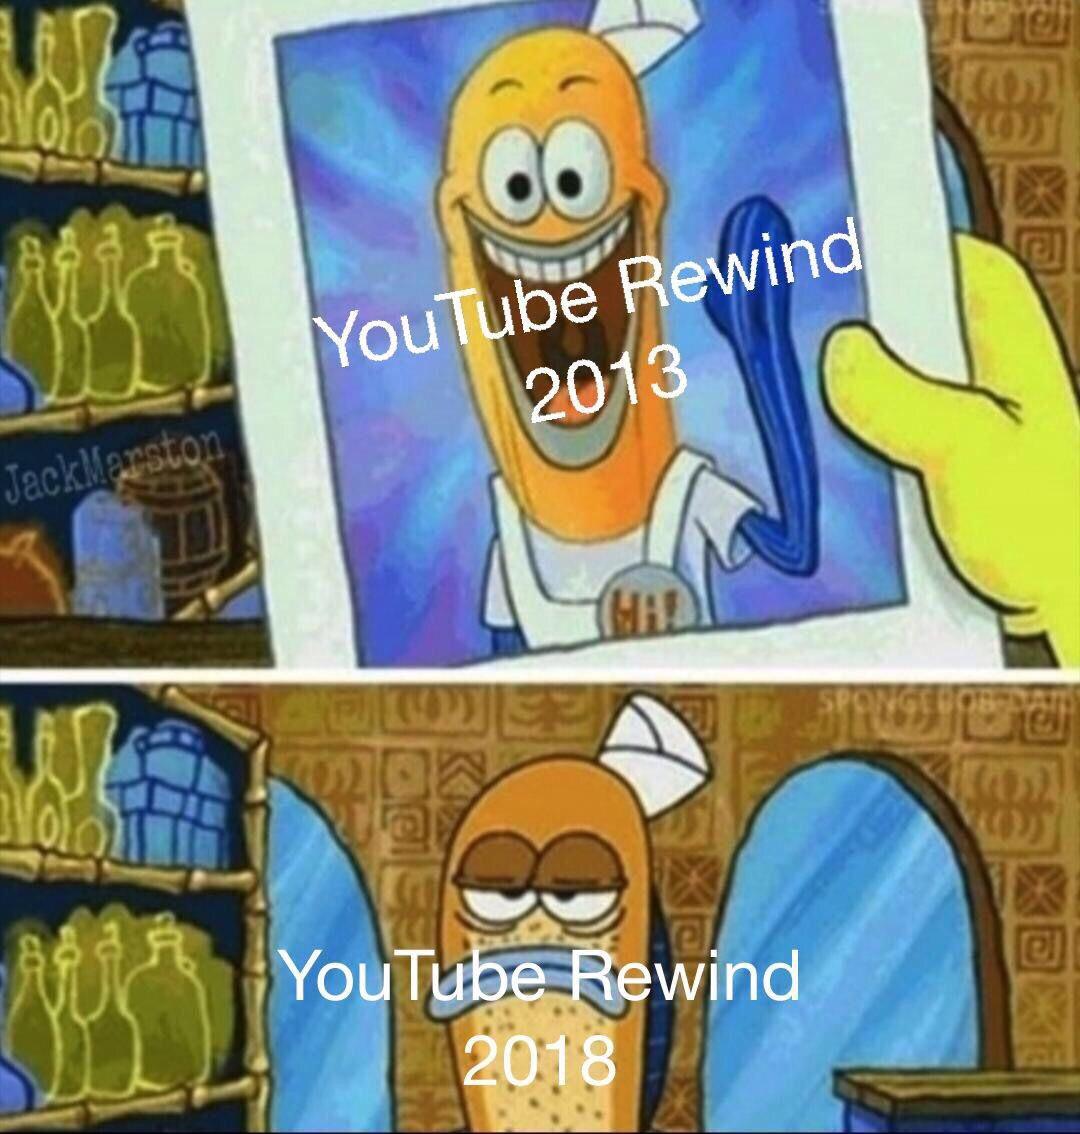 Pin By Leonardo Tobias On Meme Irl Funny Memes Spongebob Memes Youtube Rewind